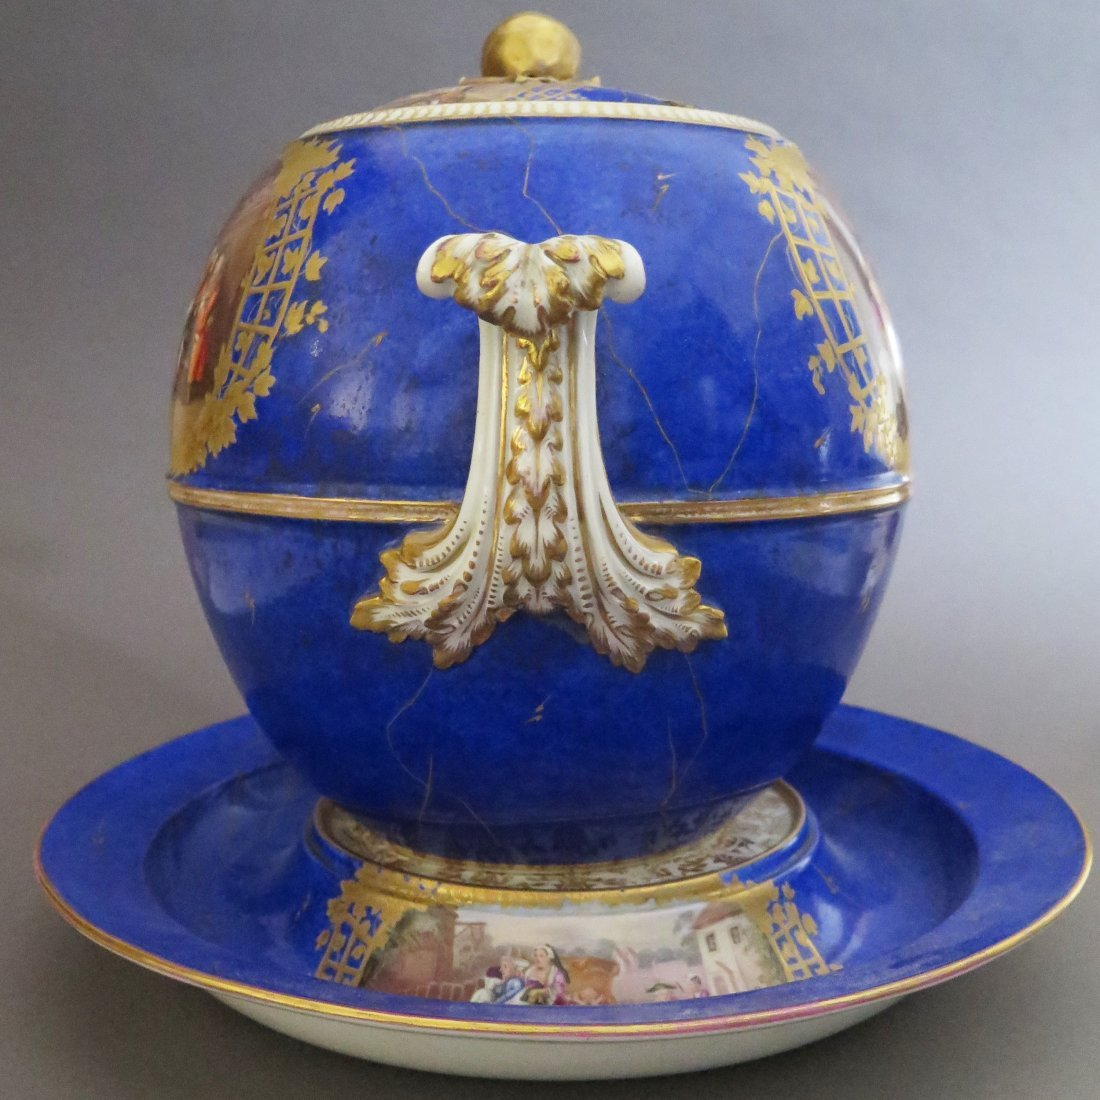 Meissen Porcelain Lidded Punch Bowl and Underplat - 4